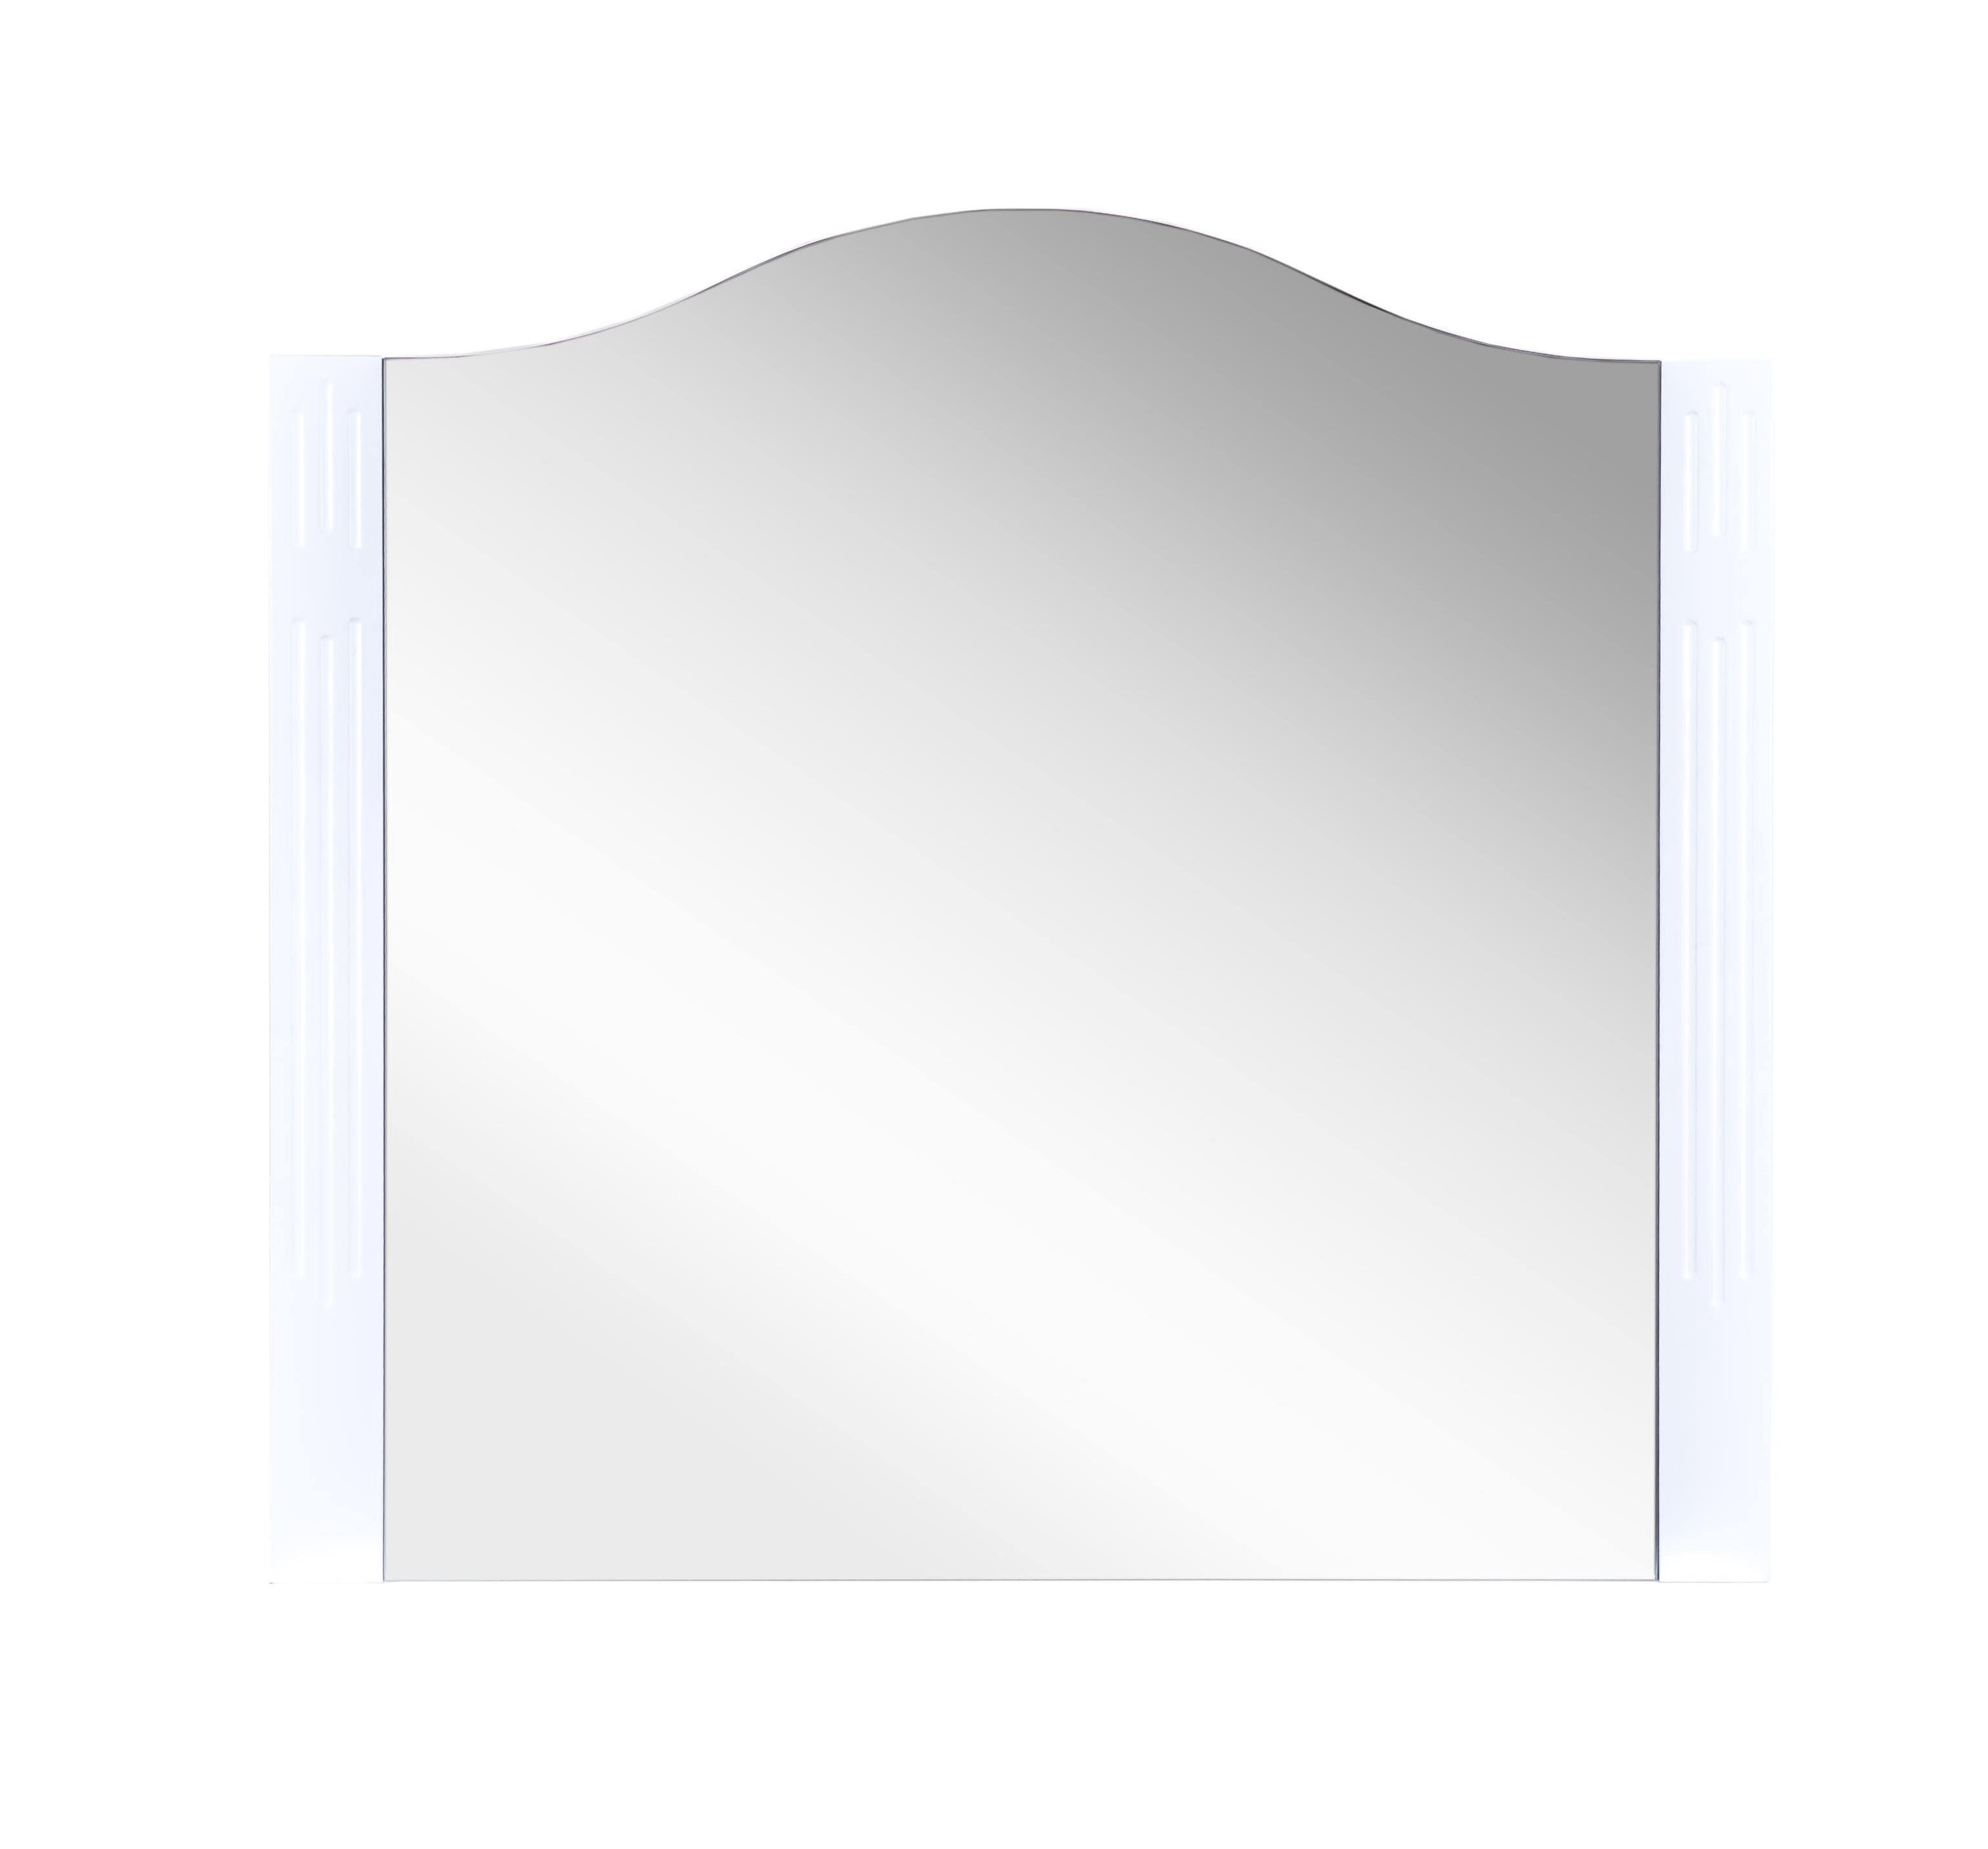 Зеркало Аква Родос Классик 2019 80 см